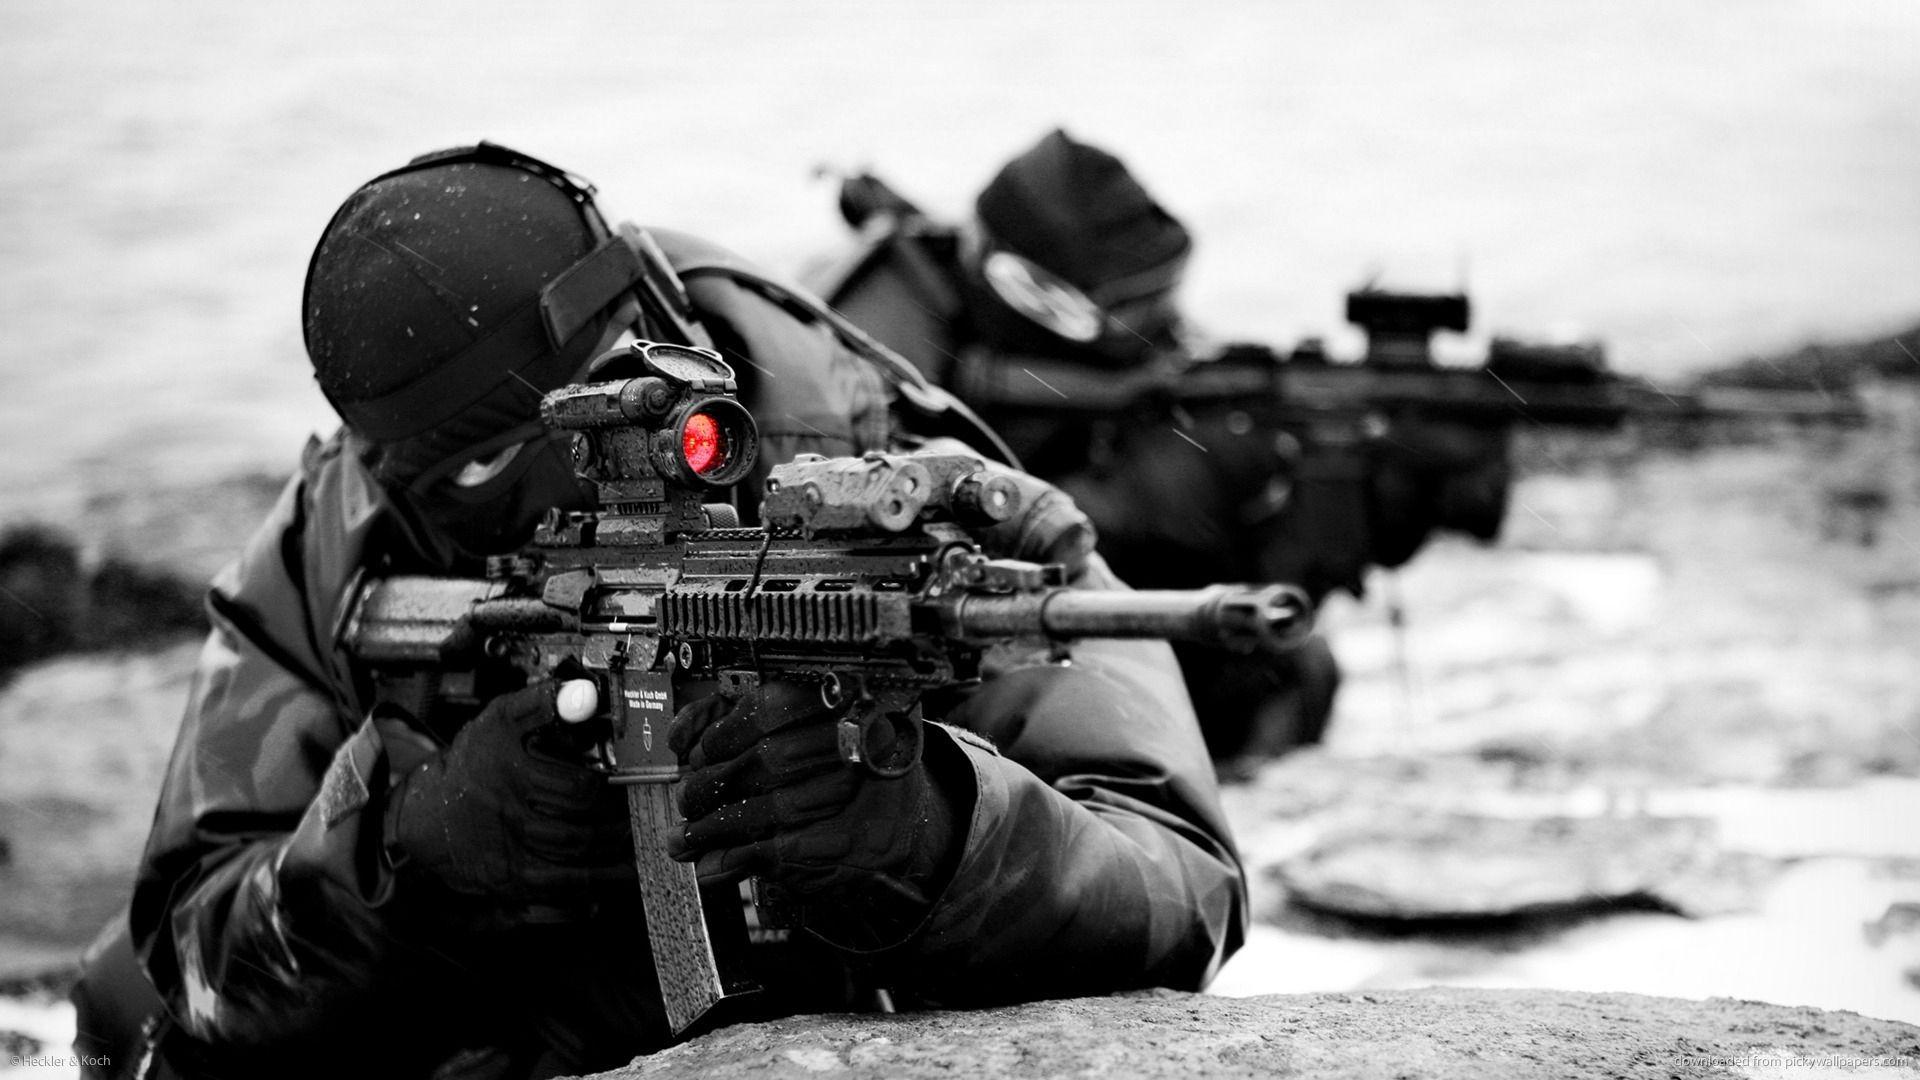 Heckler And Koch Hk416 Wallpaper Fond D Ecran Marine Photos Militaires Navy Seals